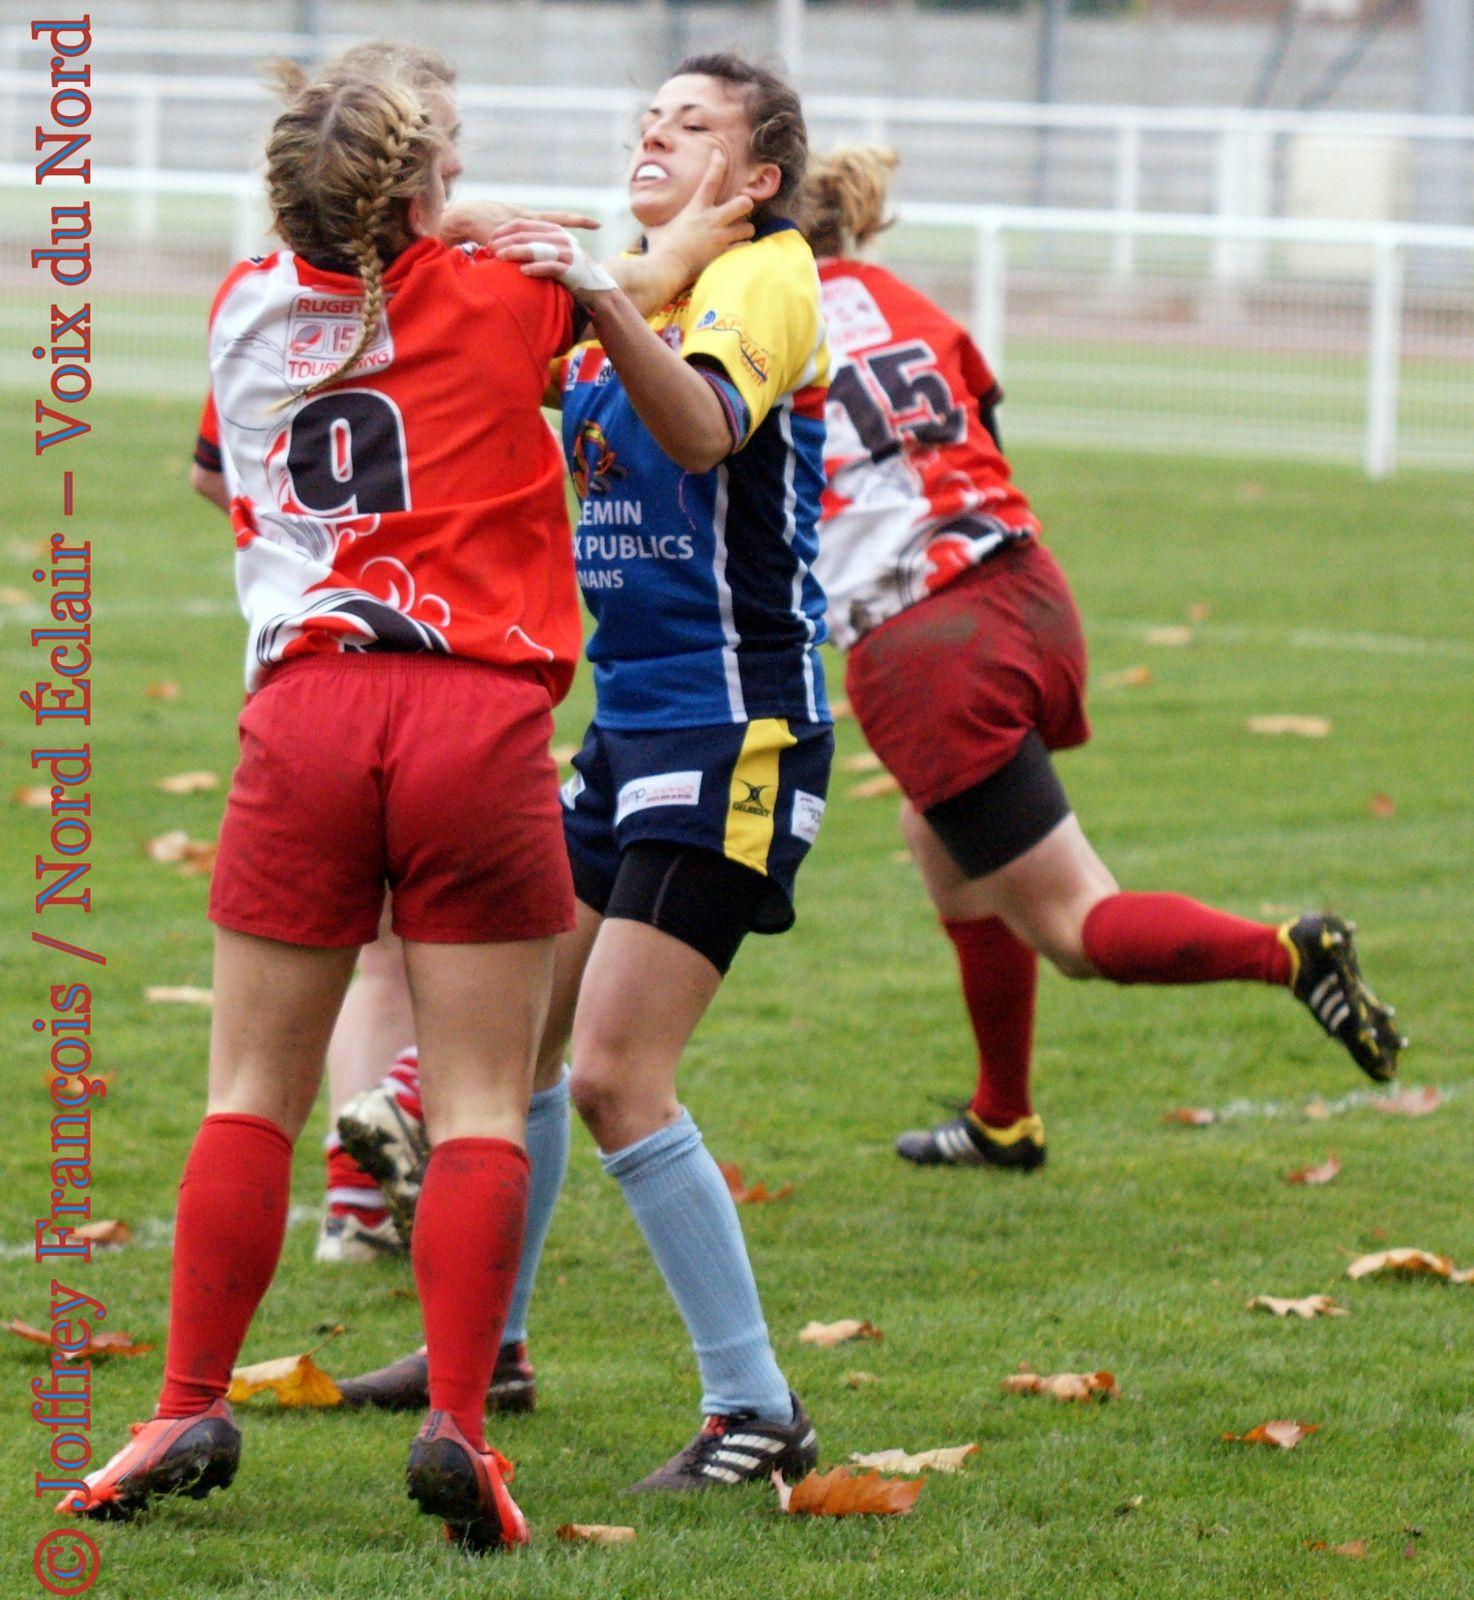 17.11.13 : Foot (DHR) et Rugby (F2)